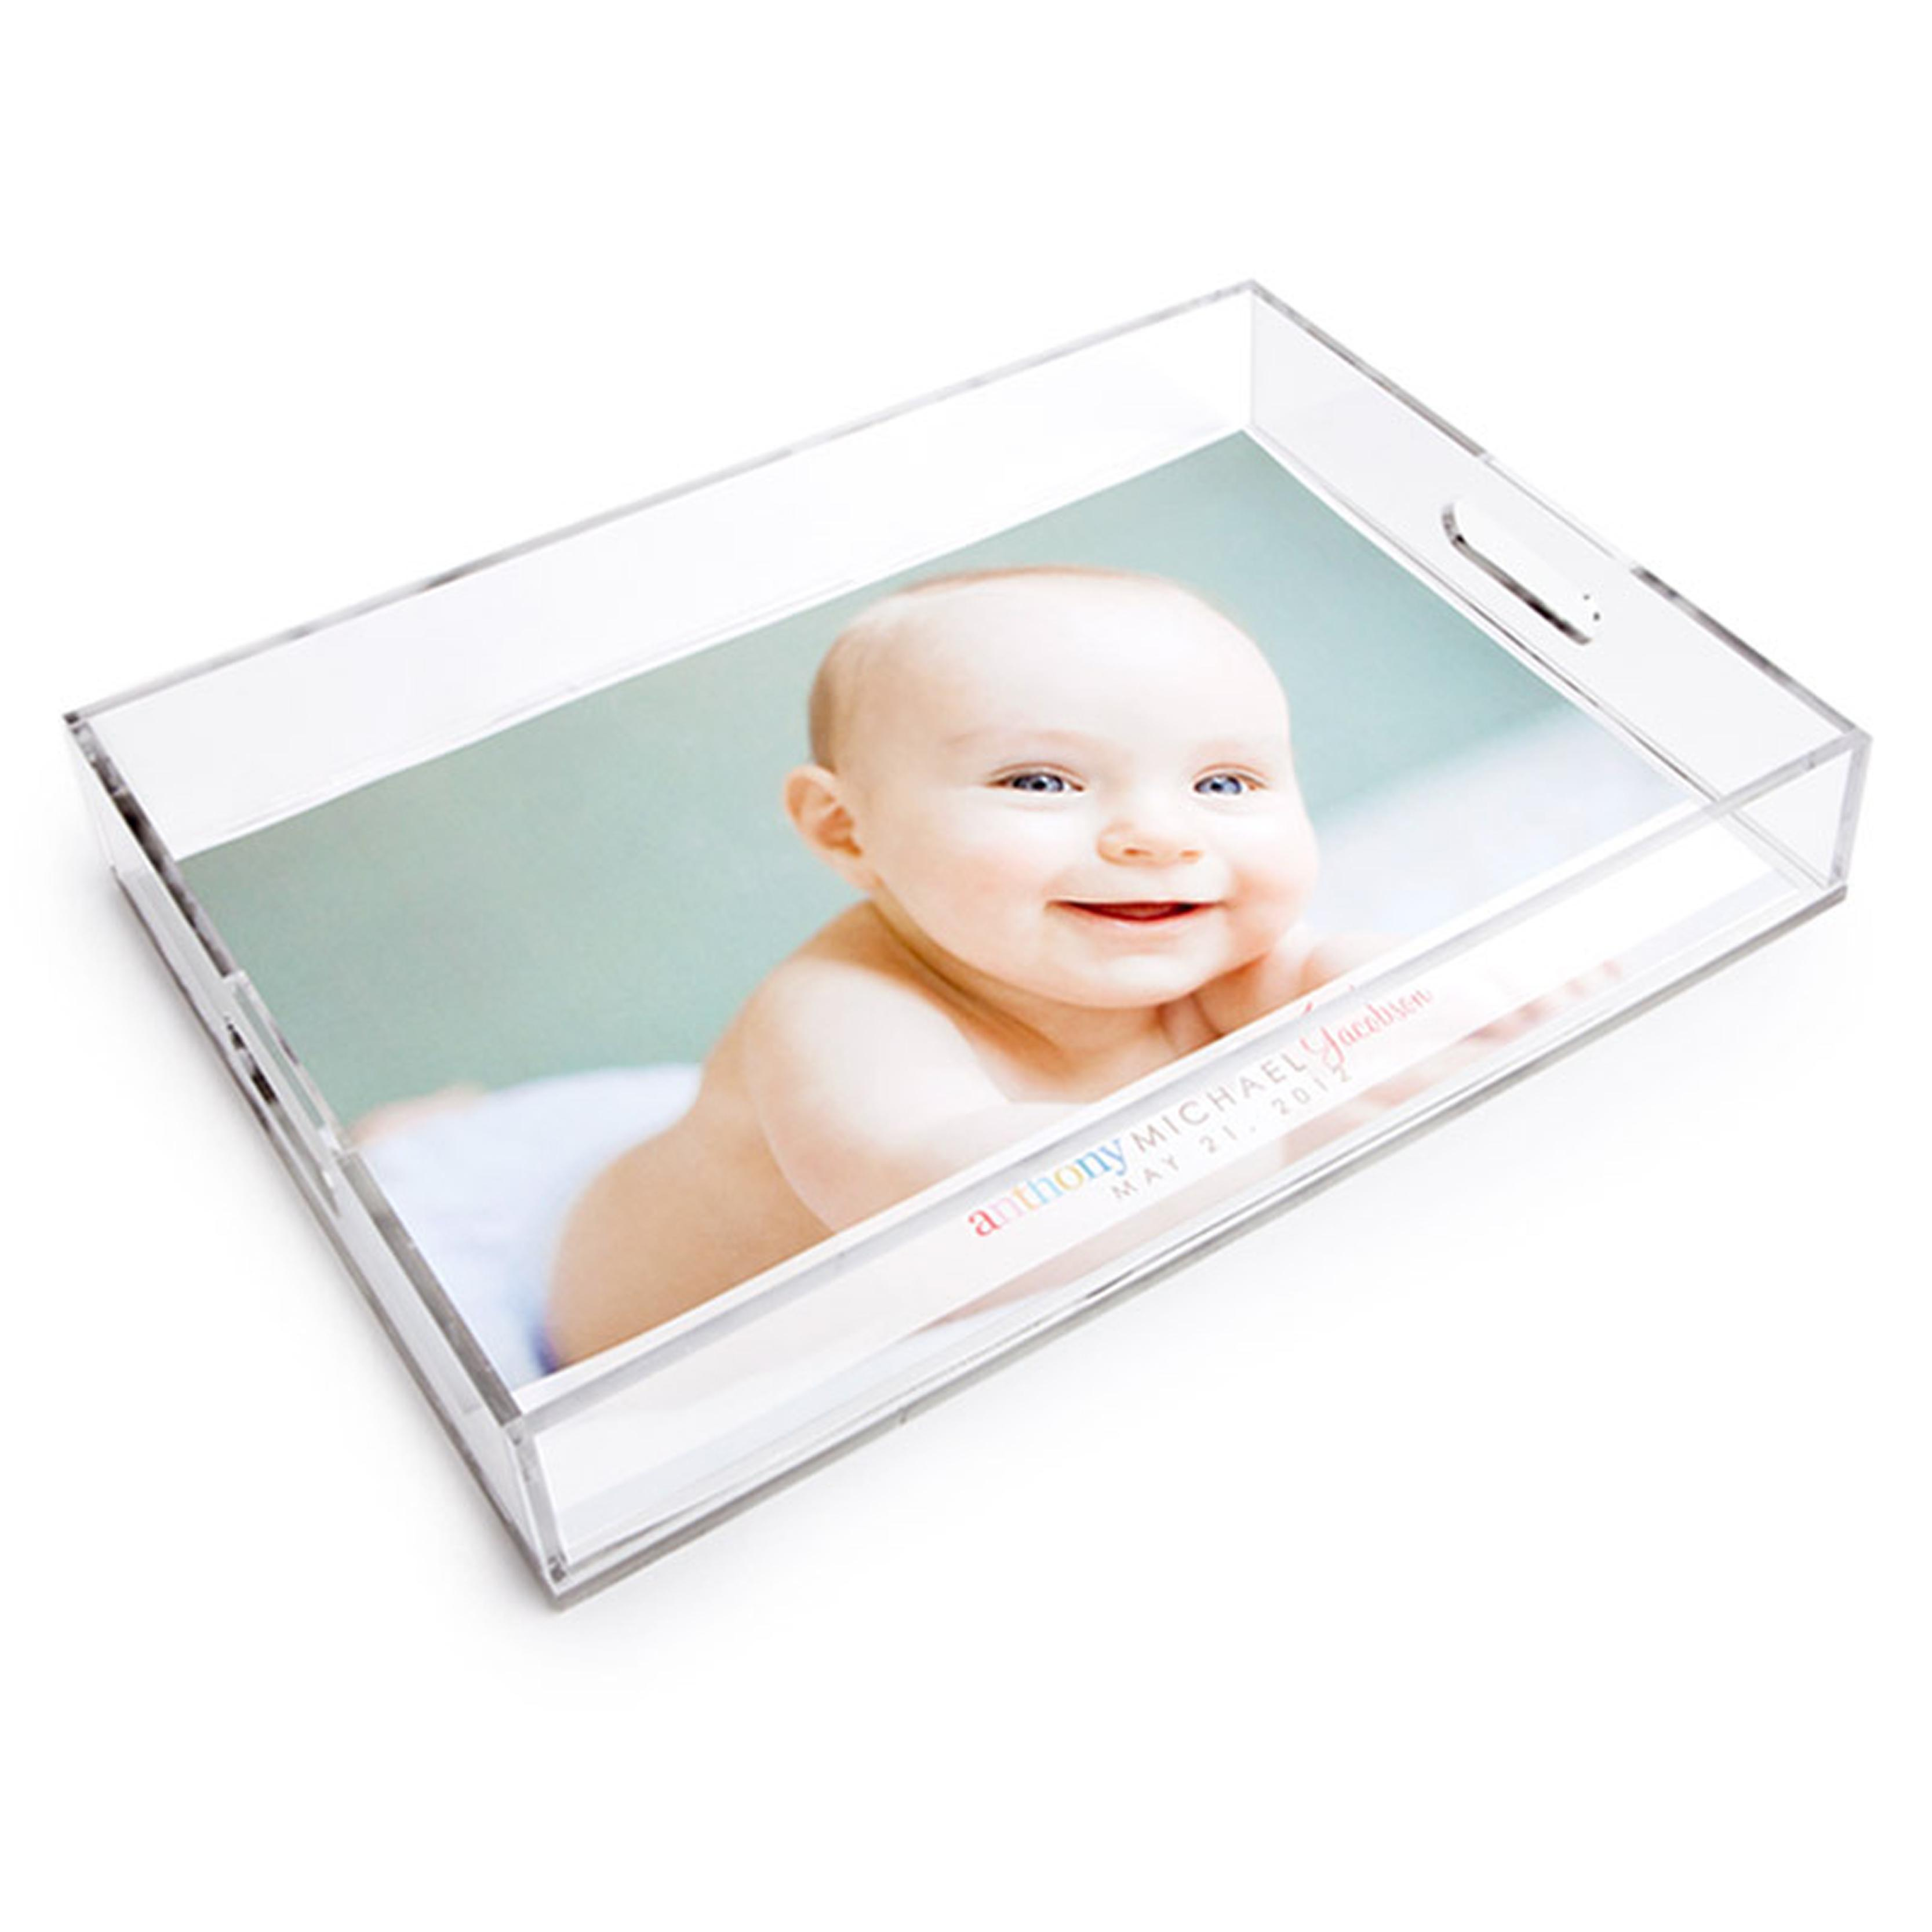 Bright_type_ _large_tray erin_condren_acrylic_tray erin_condren white